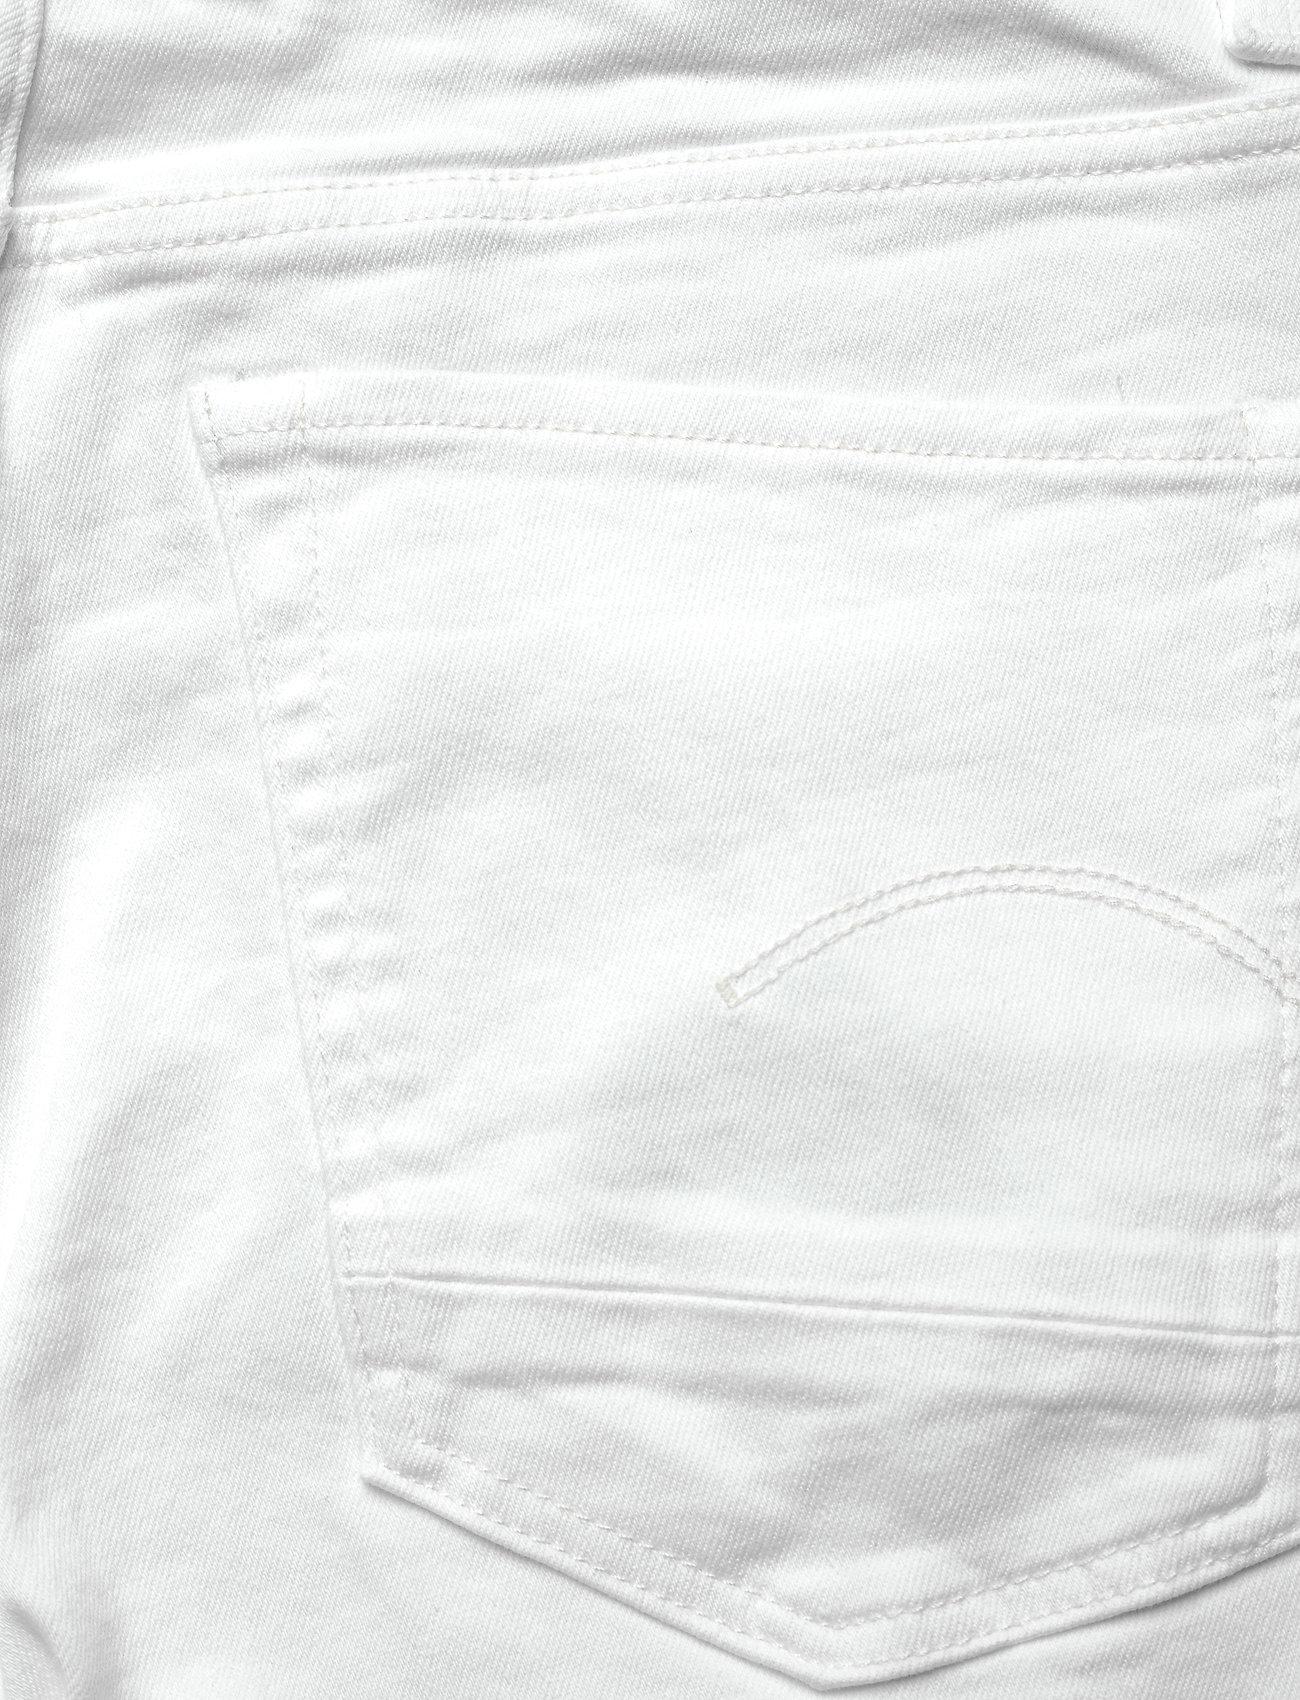 G-star RAW - Kafey Ultra High Skinny Wmn - skinny jeans - white - 4